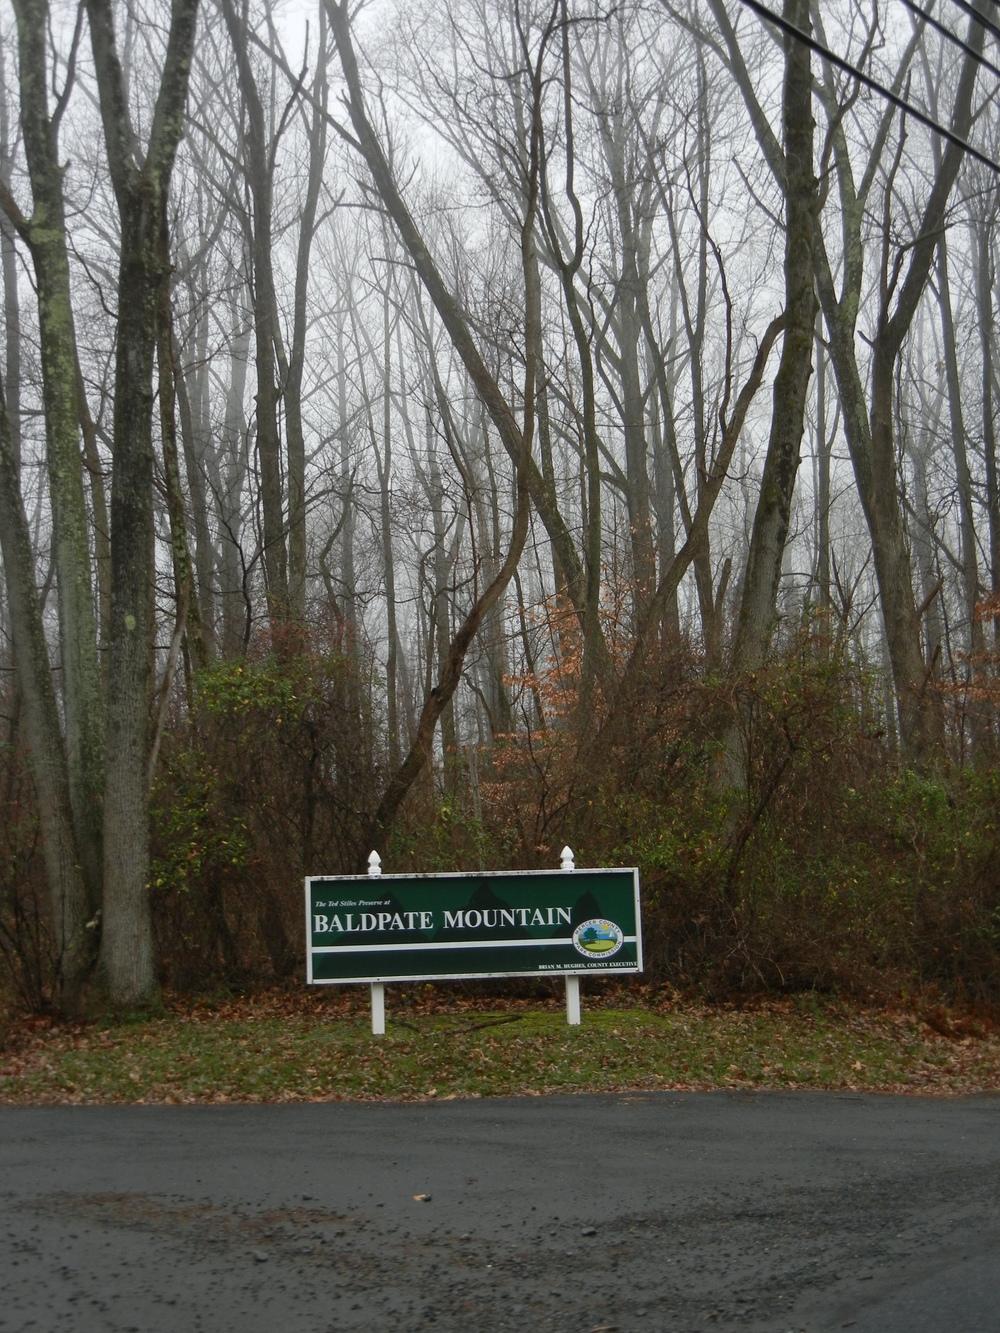 Baldpate, a hike and bike area, among the fog.